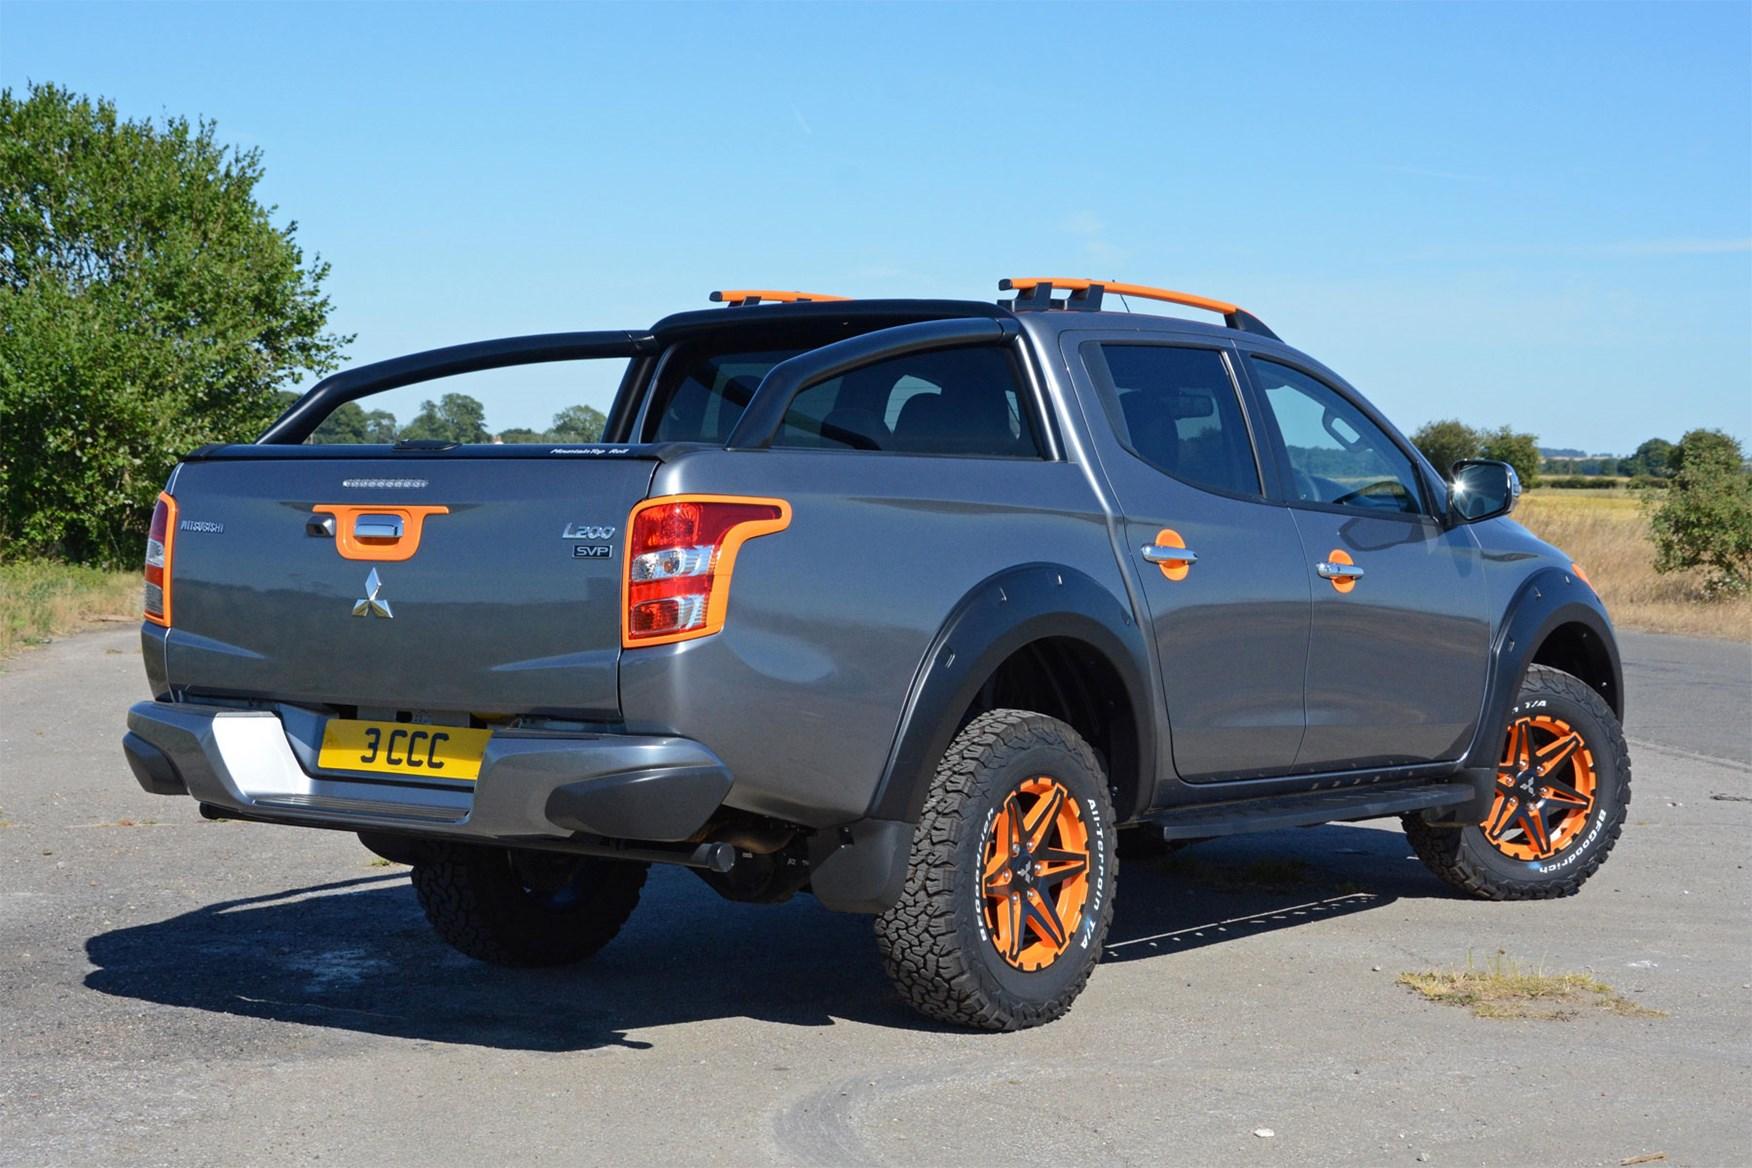 Mitsubishi L200 review, Barbarian SVP II, grey and orange, rear view